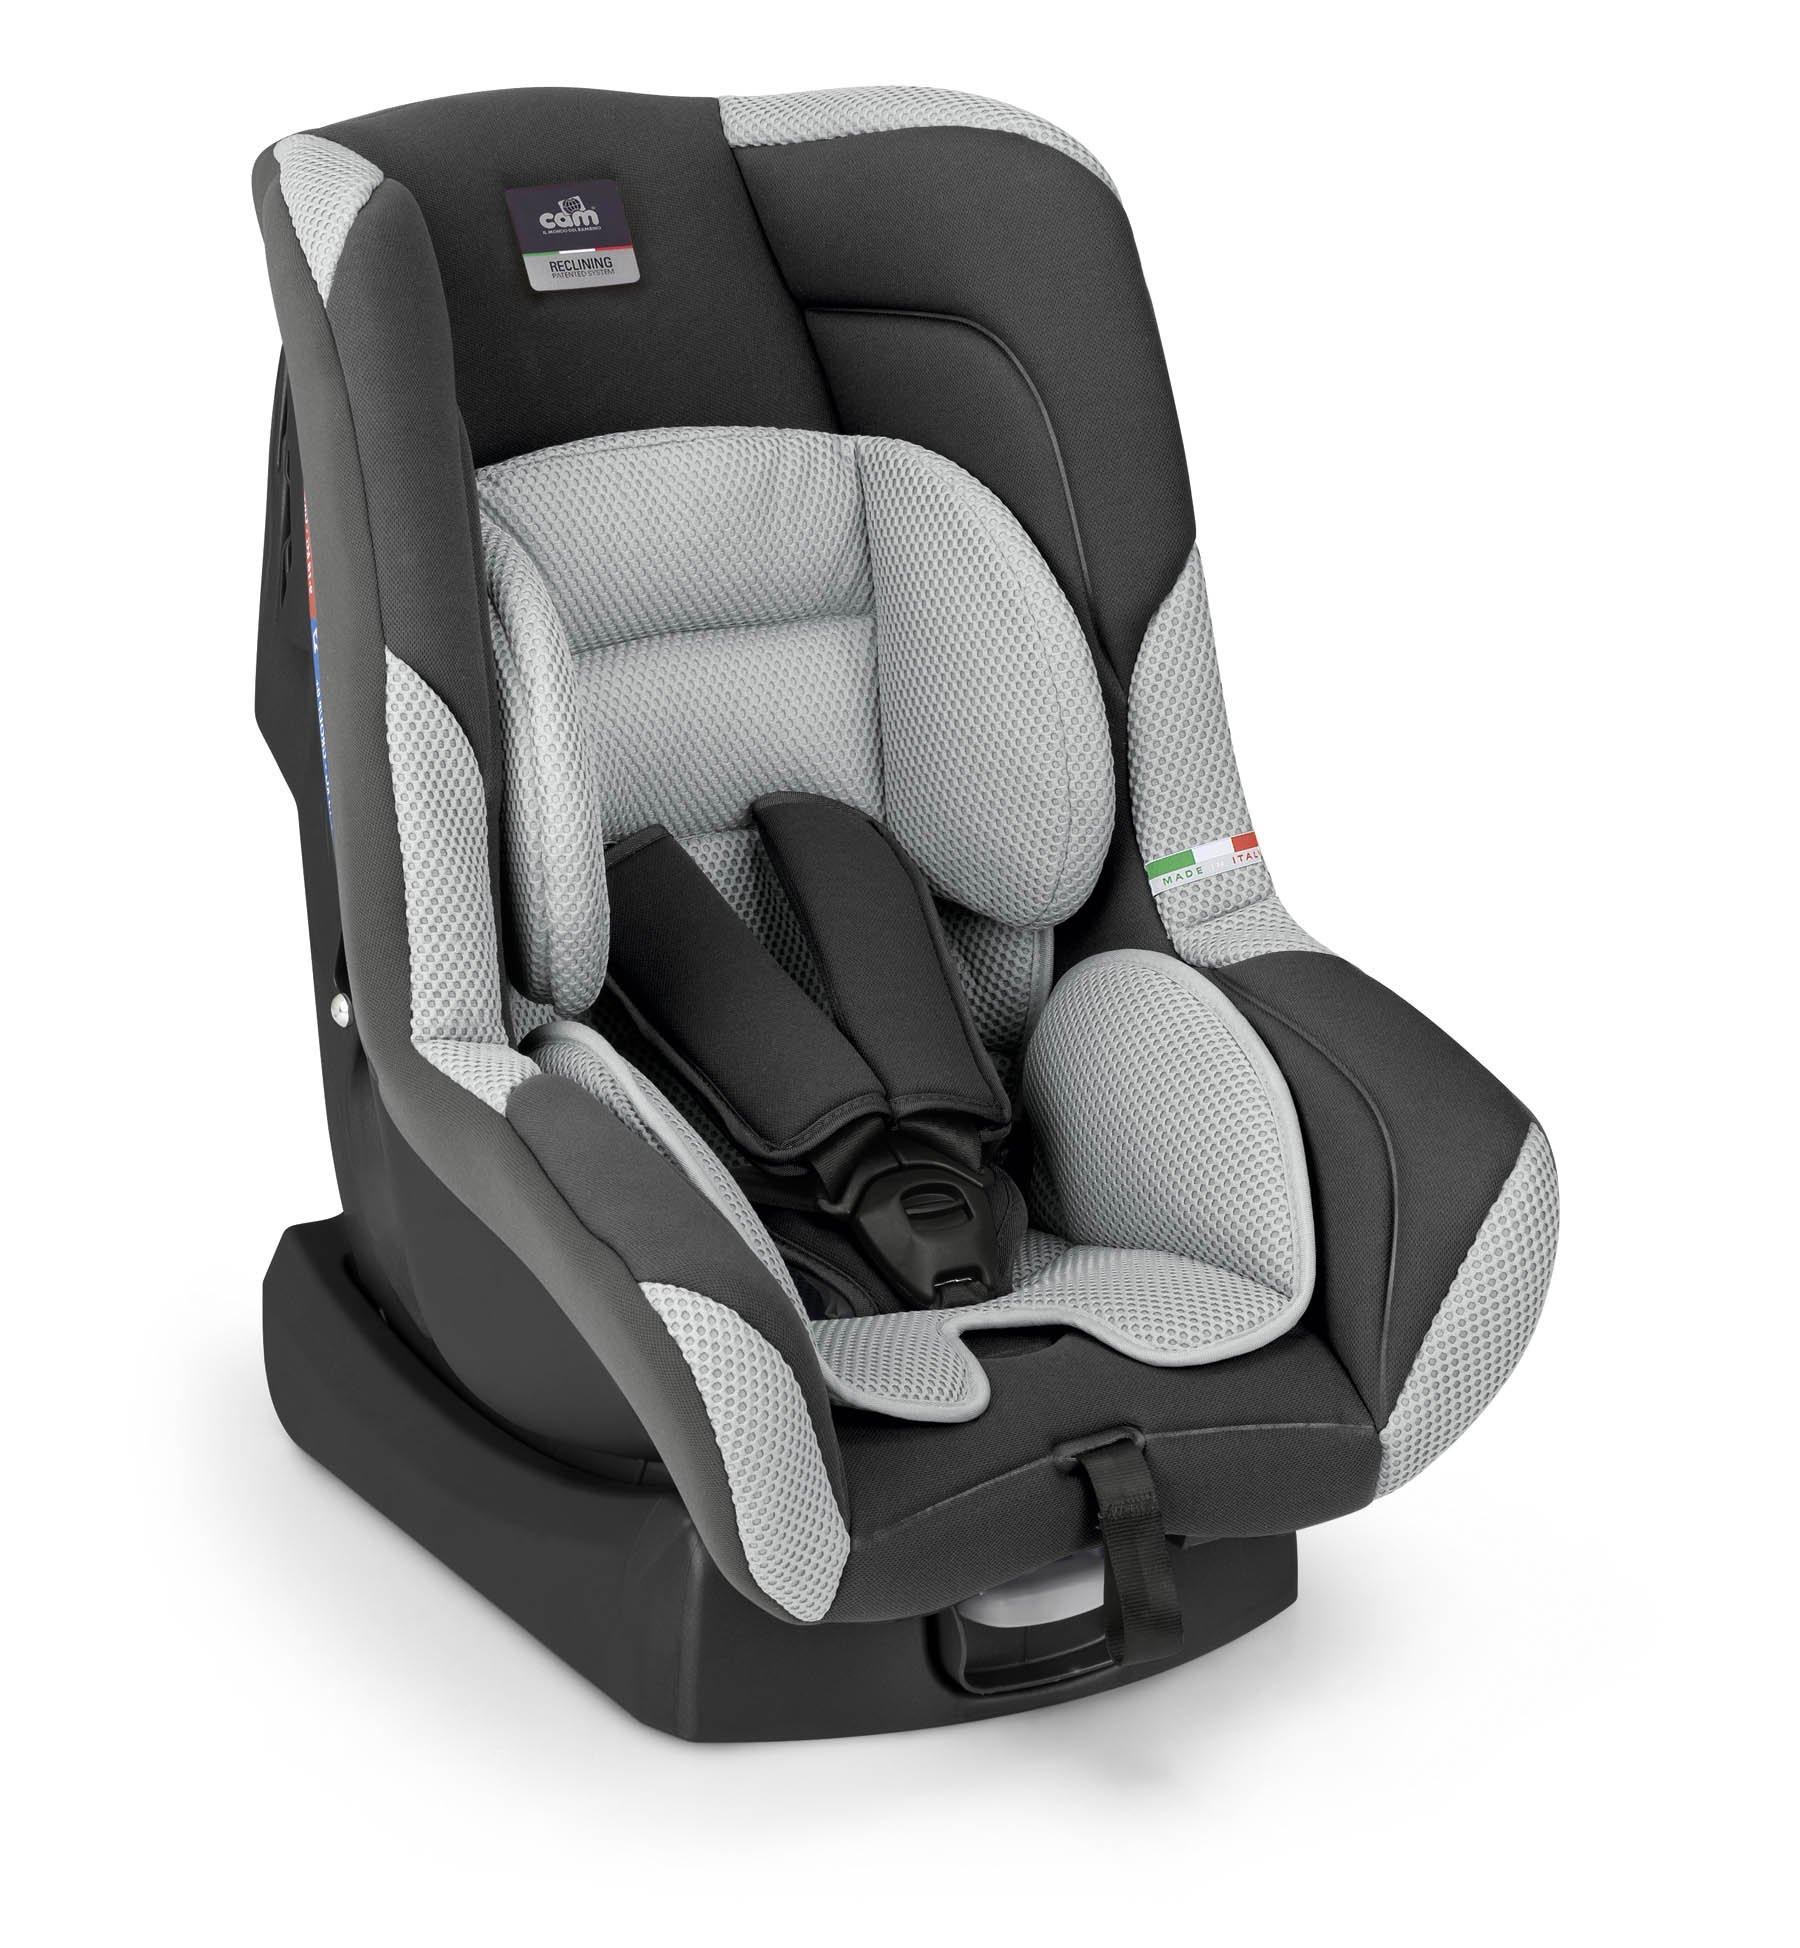 Bērnu autosēdeklis 0-18 kg ar dubulto slīpuma regulēšanu CAM GARA col.213